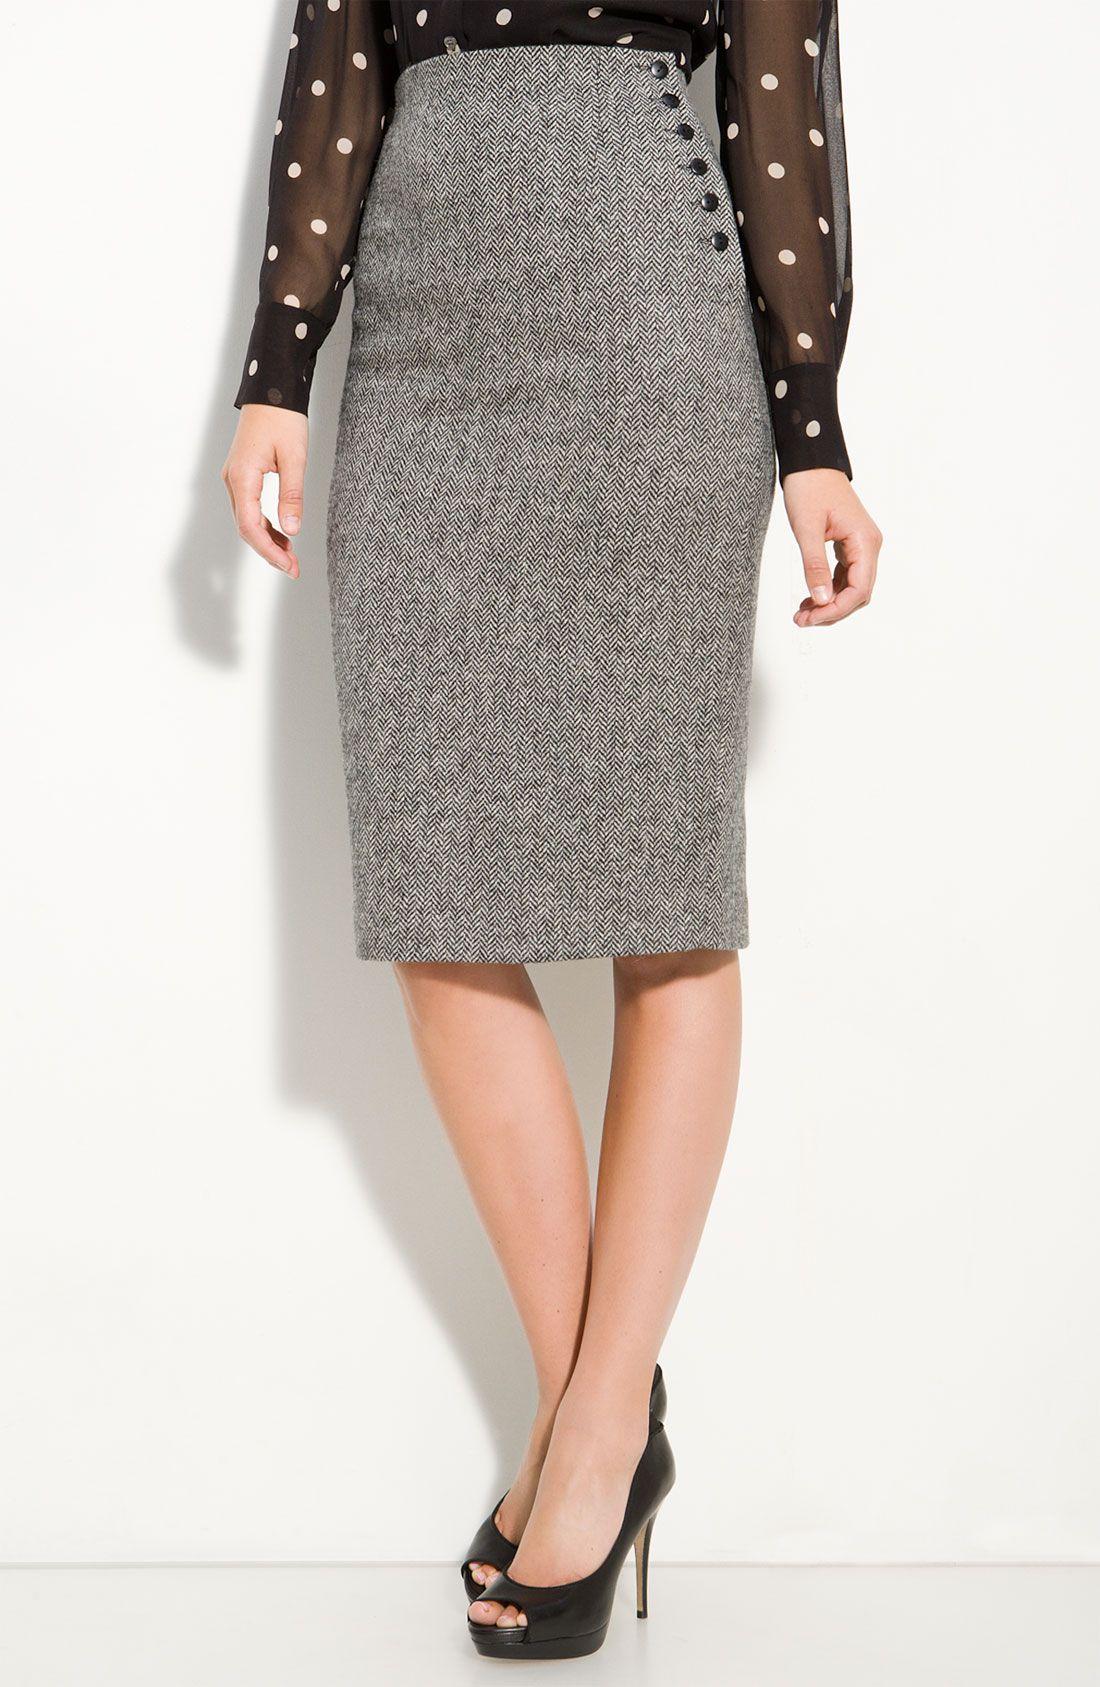 c1cfe417d Great High Waist Wool Tweed Pencil skirt, love the button detail and  length. Super cute with polka dot dress shirt.